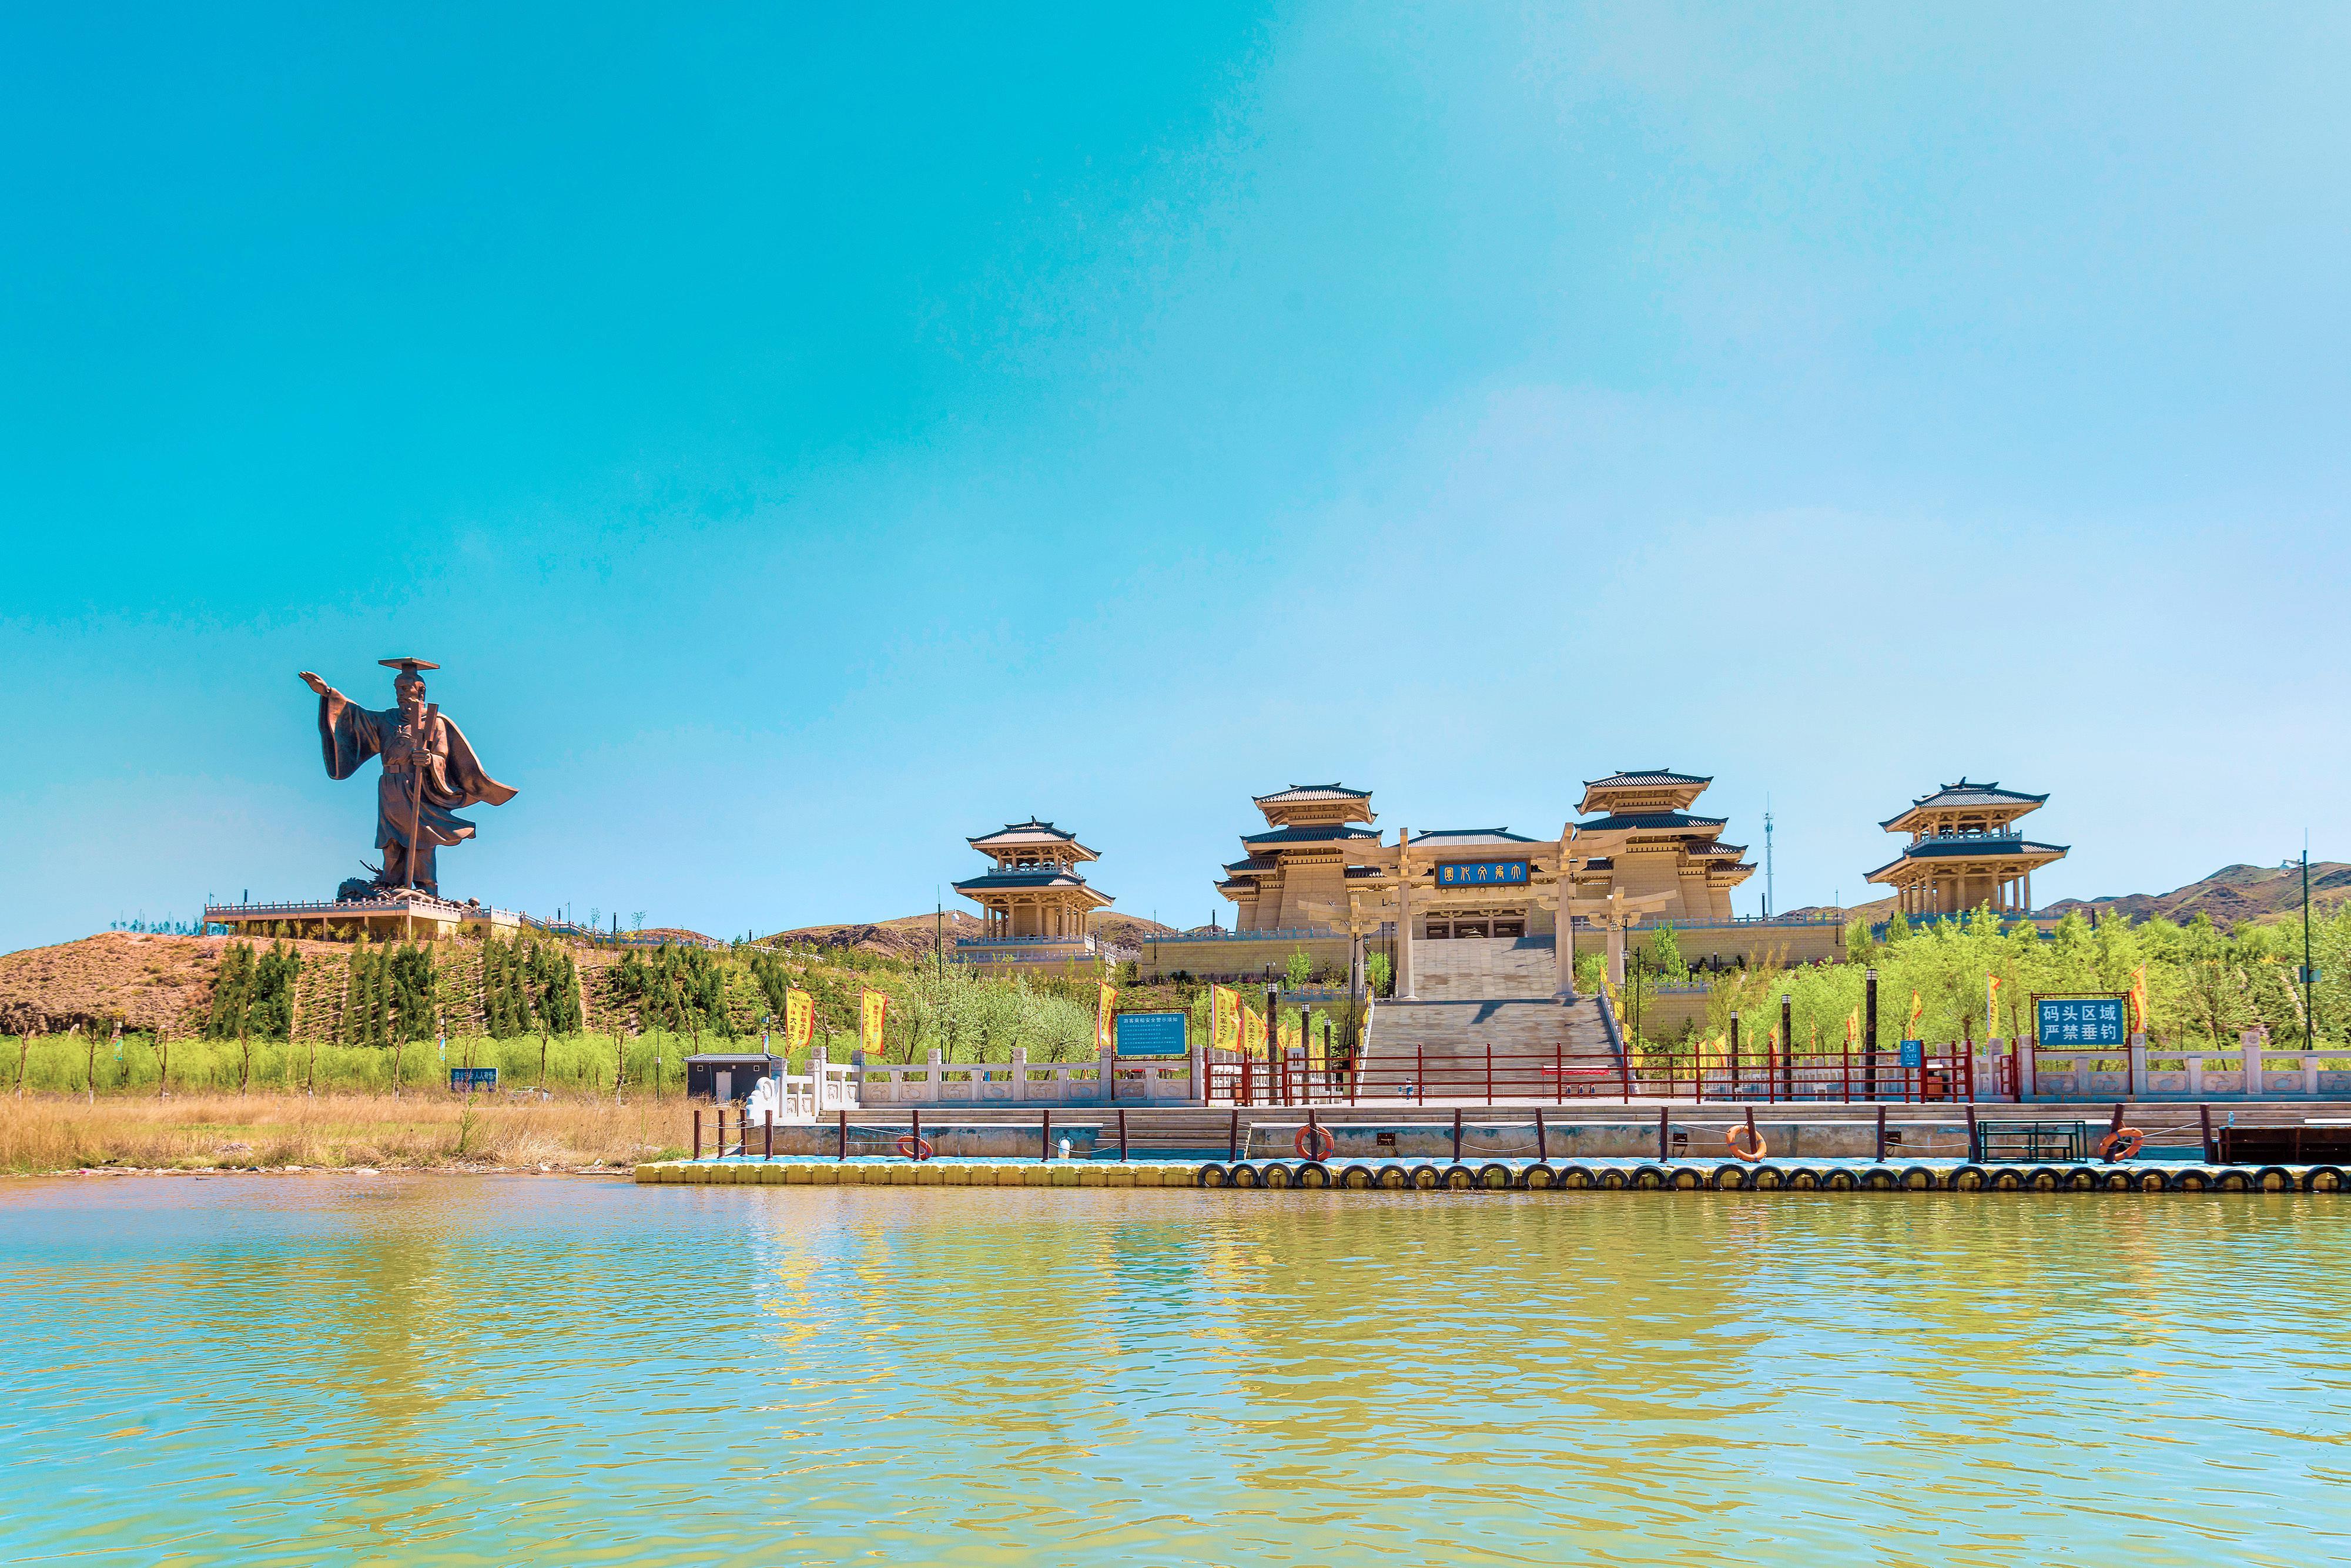 Qingtongxia Yellow River Canyon